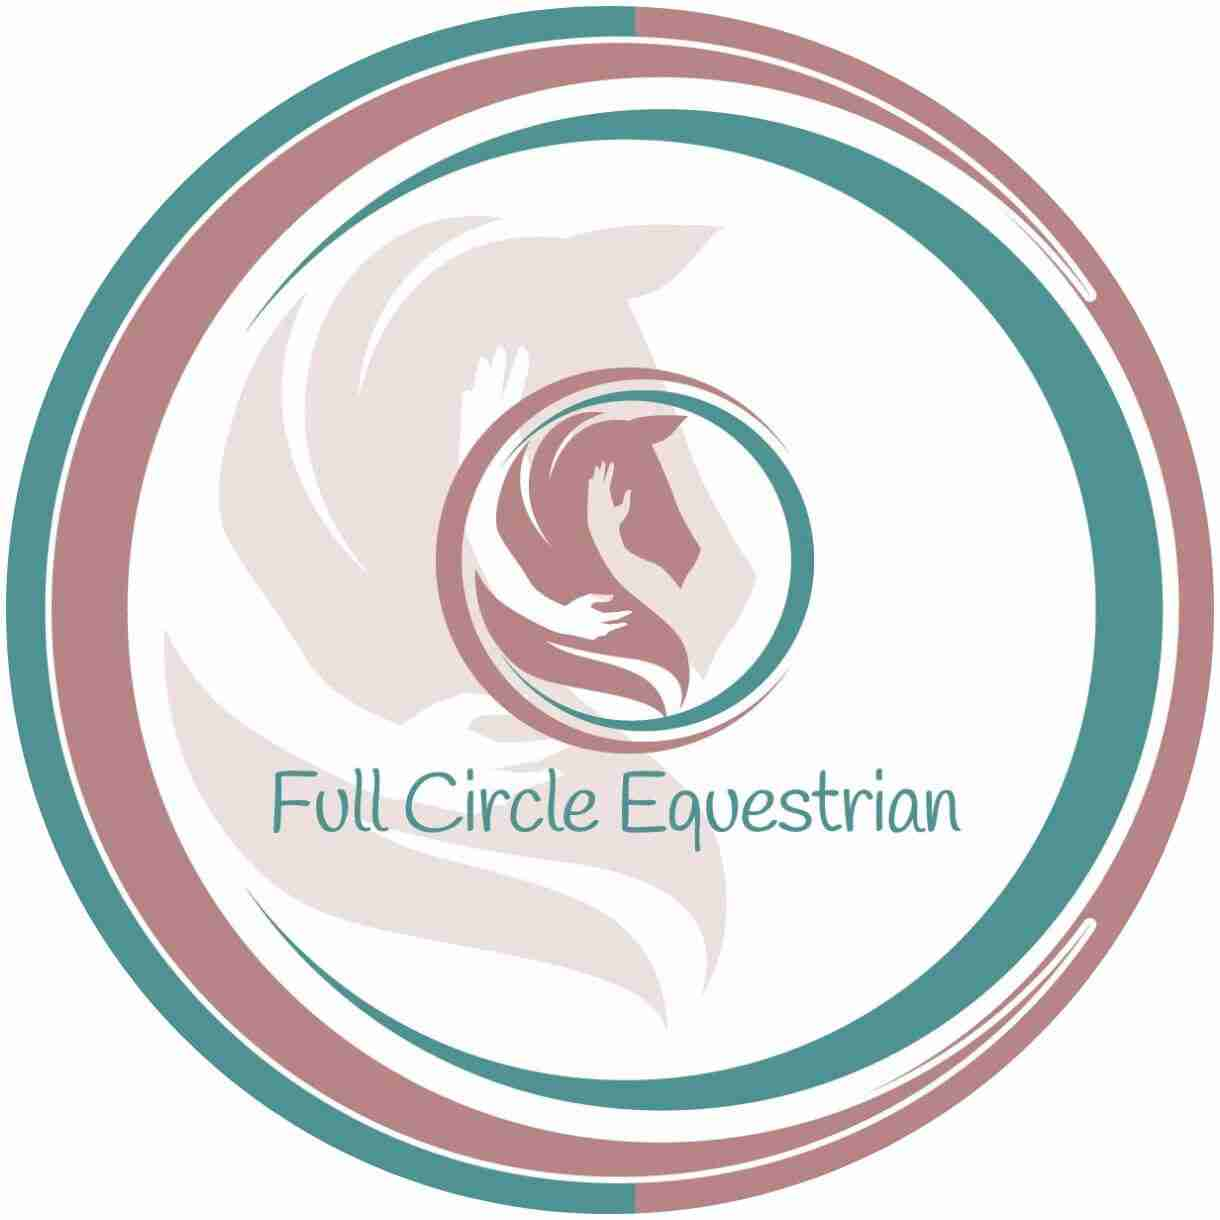 Full Circle Equestrian